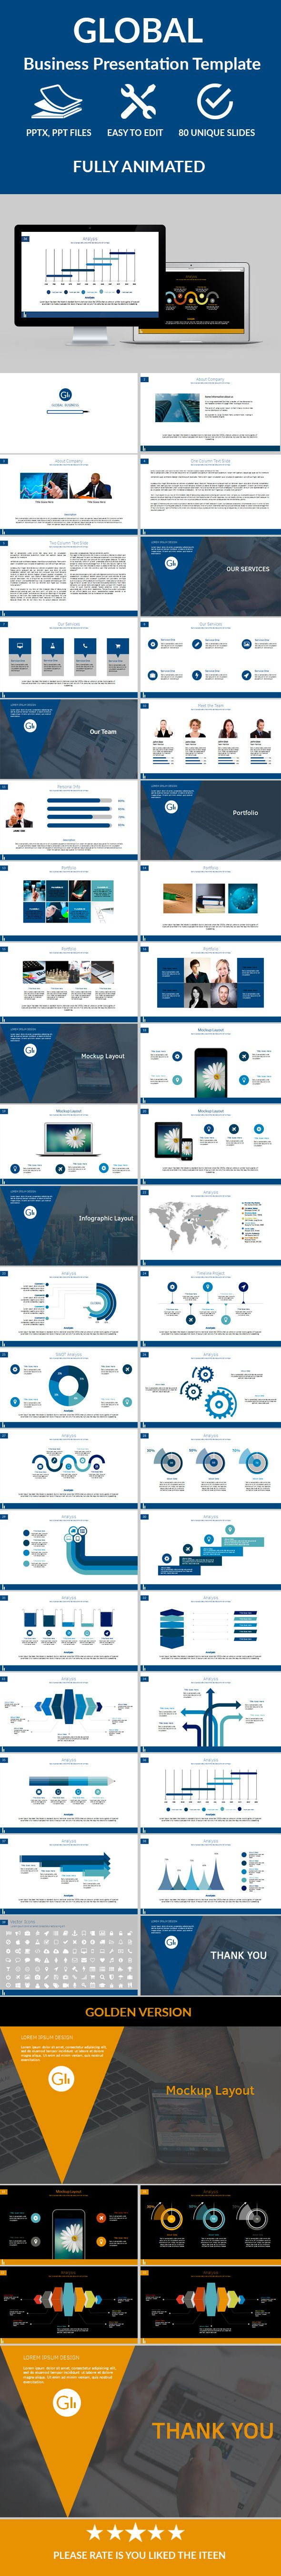 Global business powerpoint presentation business powerpoint global business powerpoint presentation template design slides download toneelgroepblik Image collections